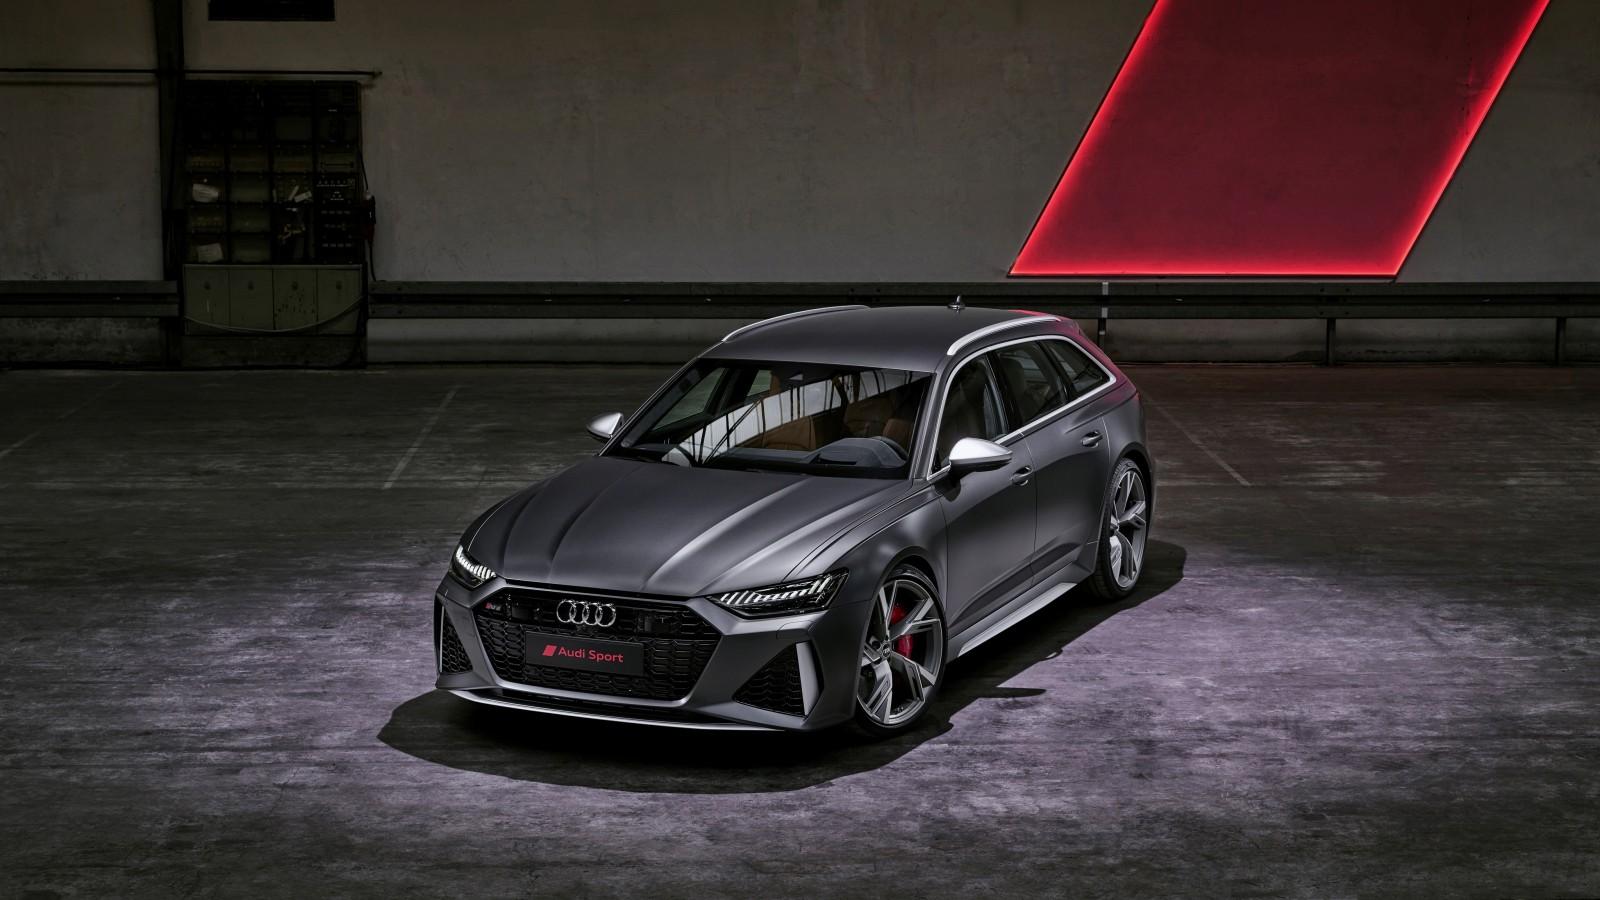 2020 Audi RS6 Avant 4K 3 Wallpaper | HD Car Wallpapers | ID #13061